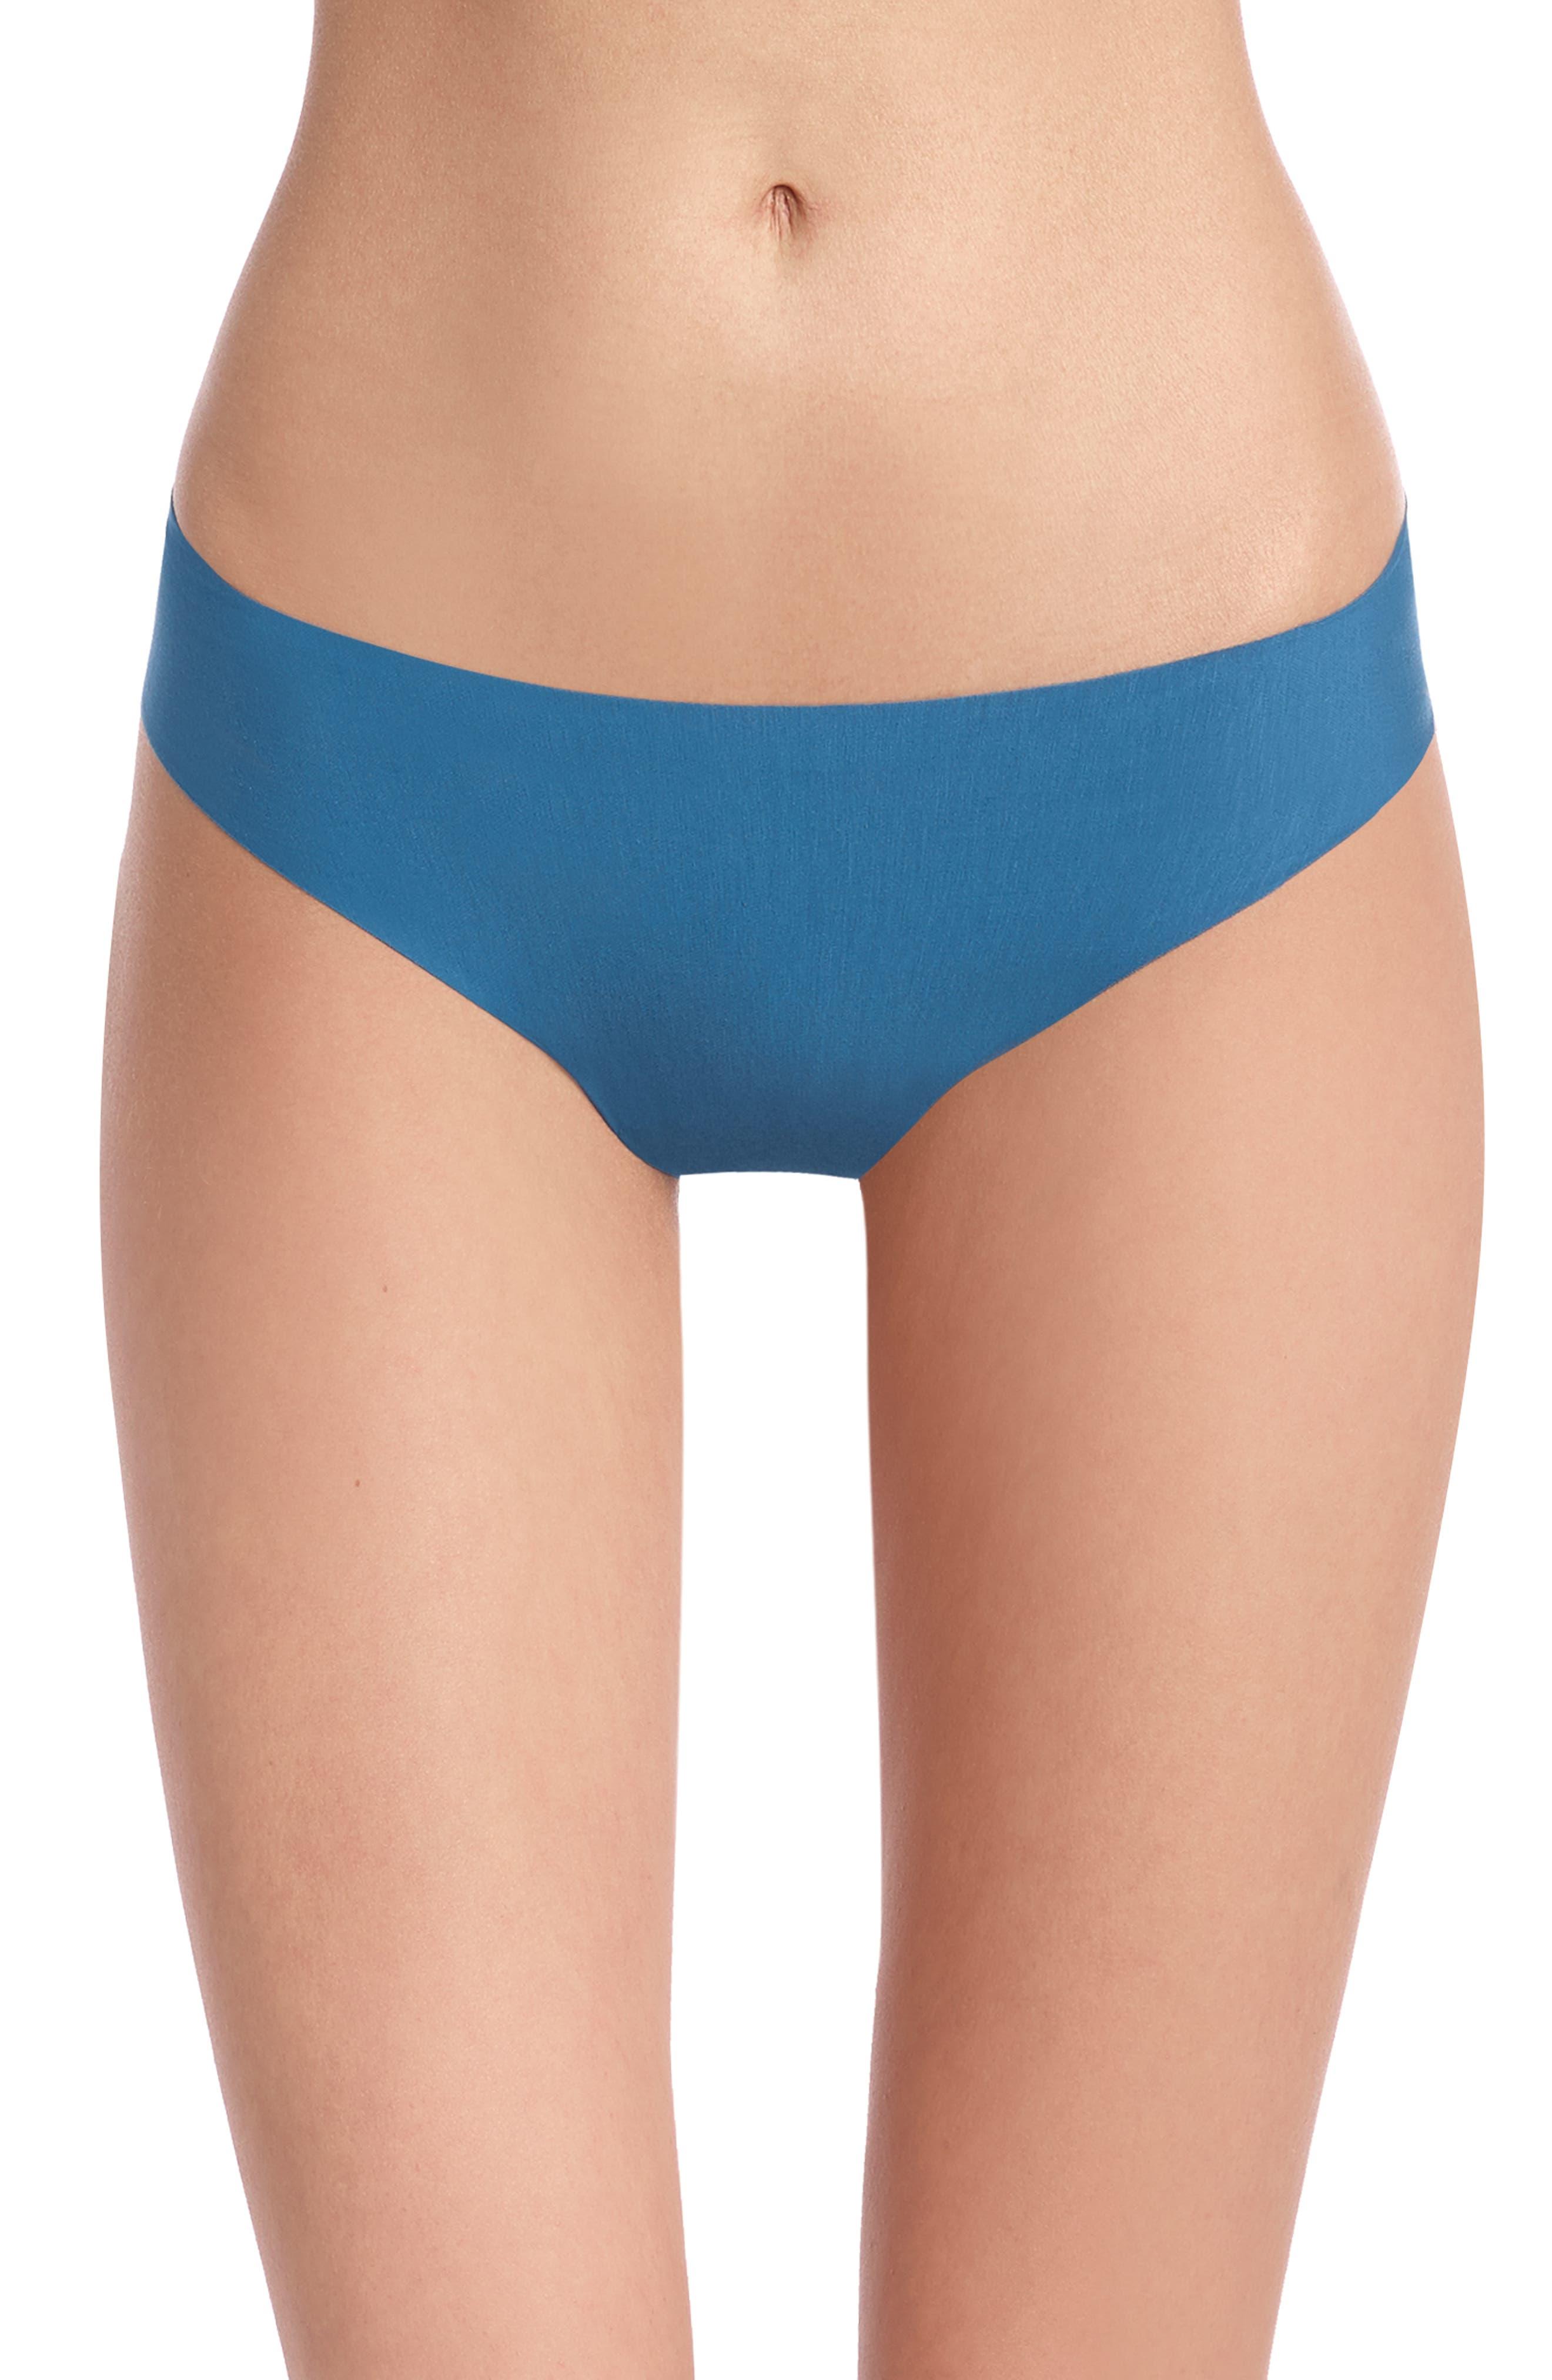 'Butter' Stretch Modal Thong,                         Main,                         color, THAI BLUE